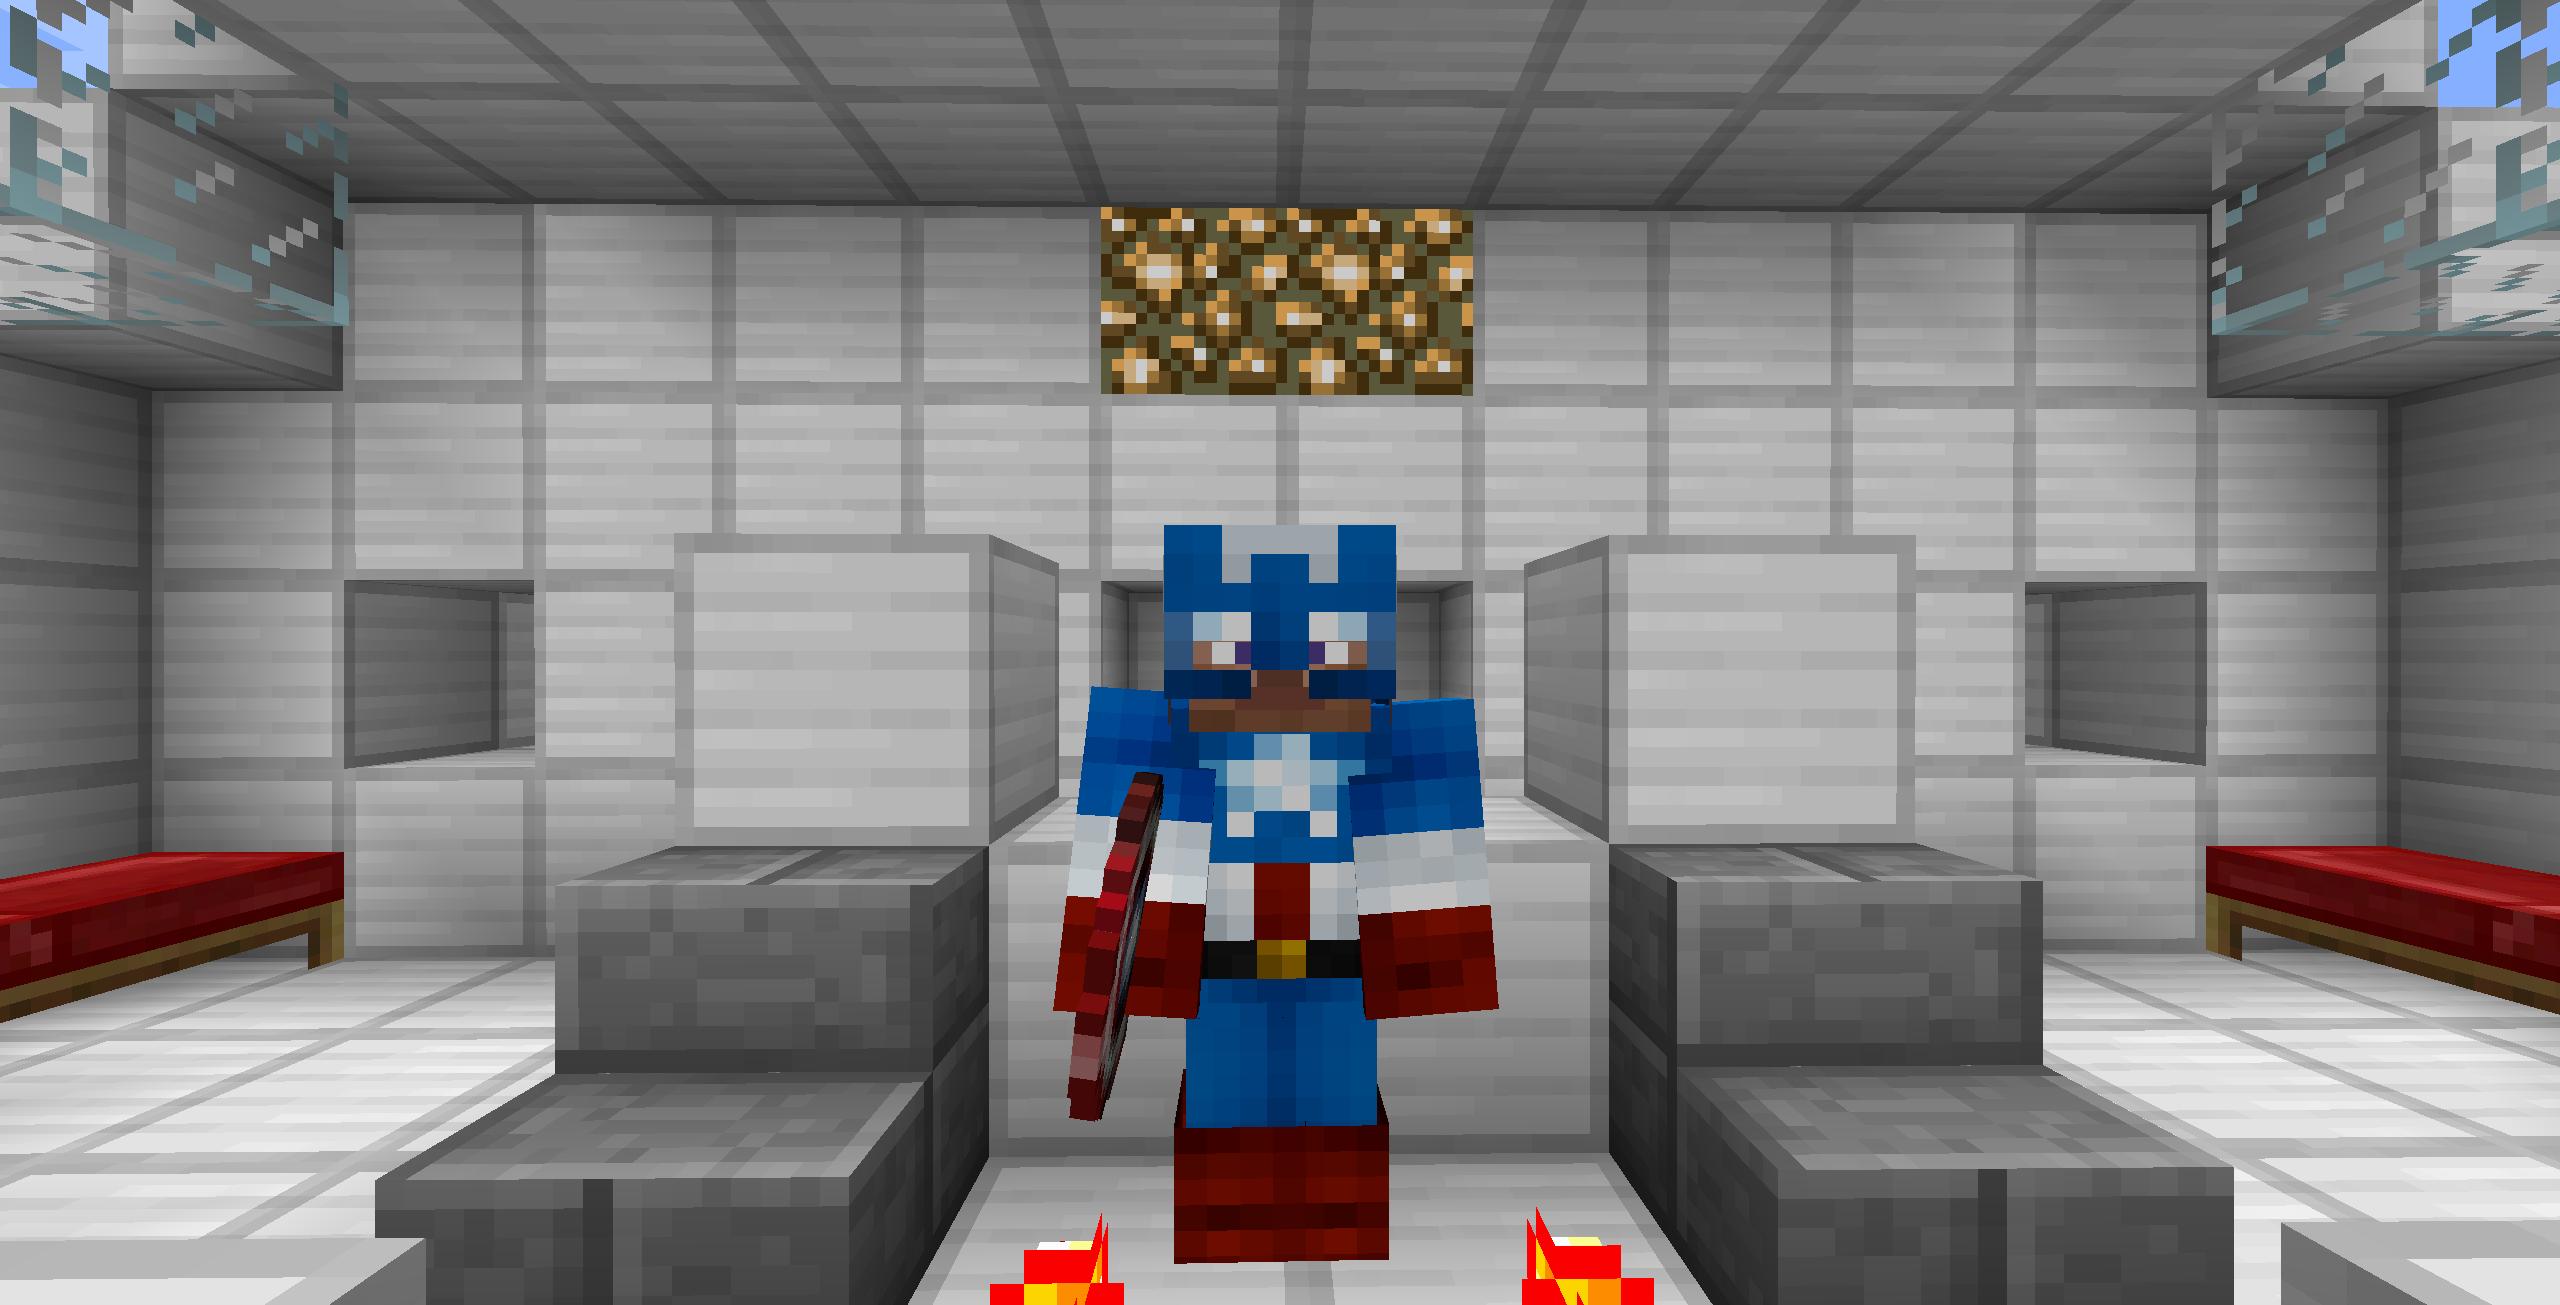 моды на майнкрафт 1.6.4 супергероев